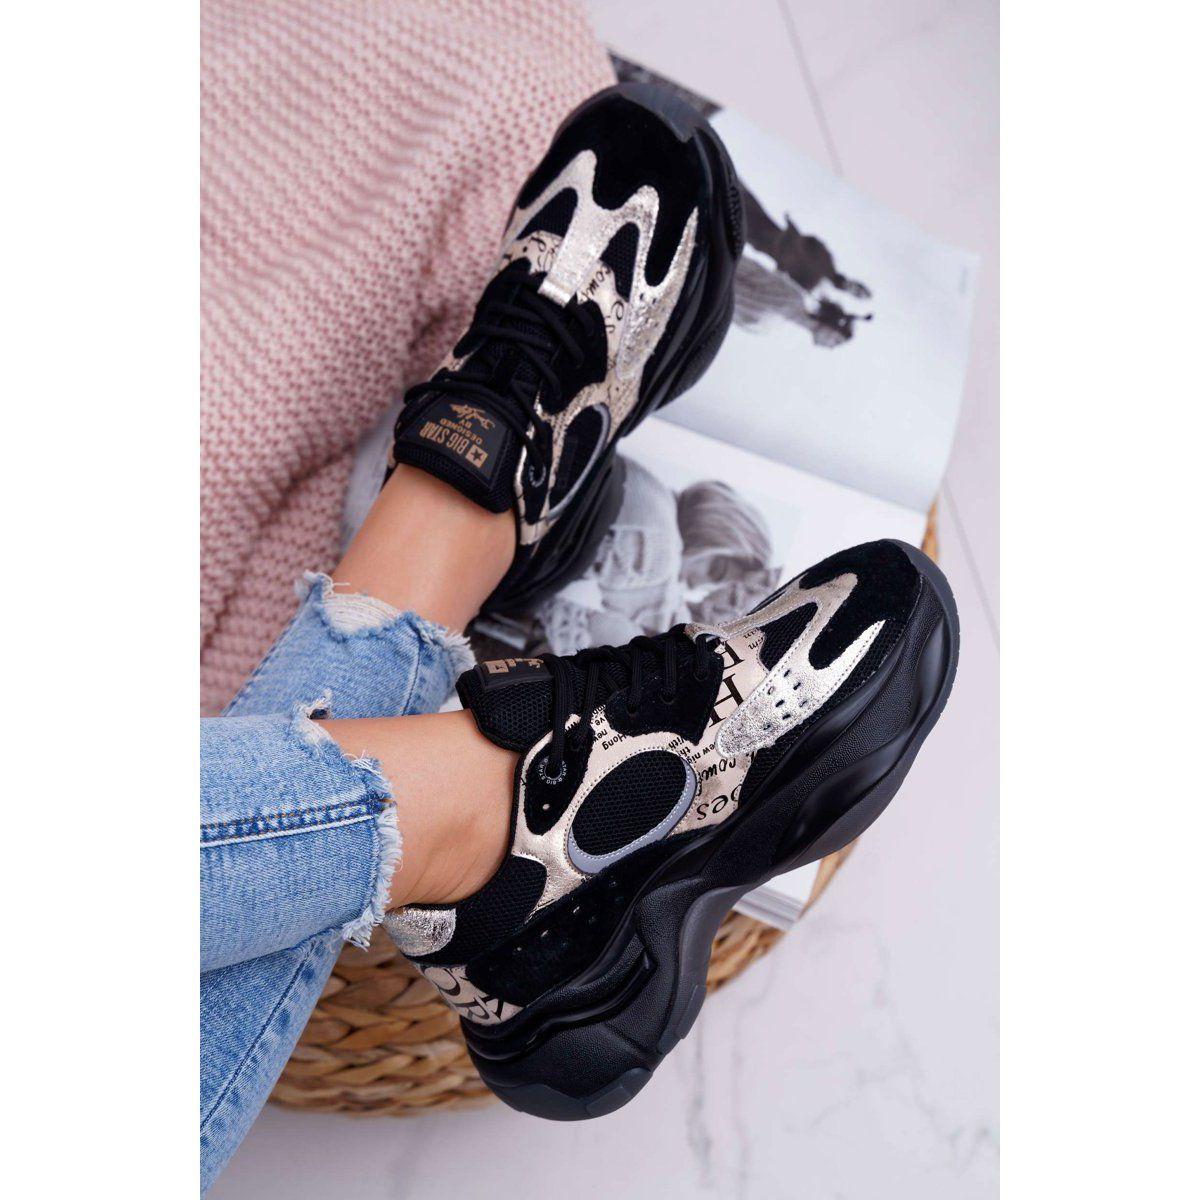 Damskie Sportowe Obuwie Big Star By Daniel Lopez Czarno Zlote Ff274a524 Czarne Zolte Bow Sneakers Sneakers Nike Shoes